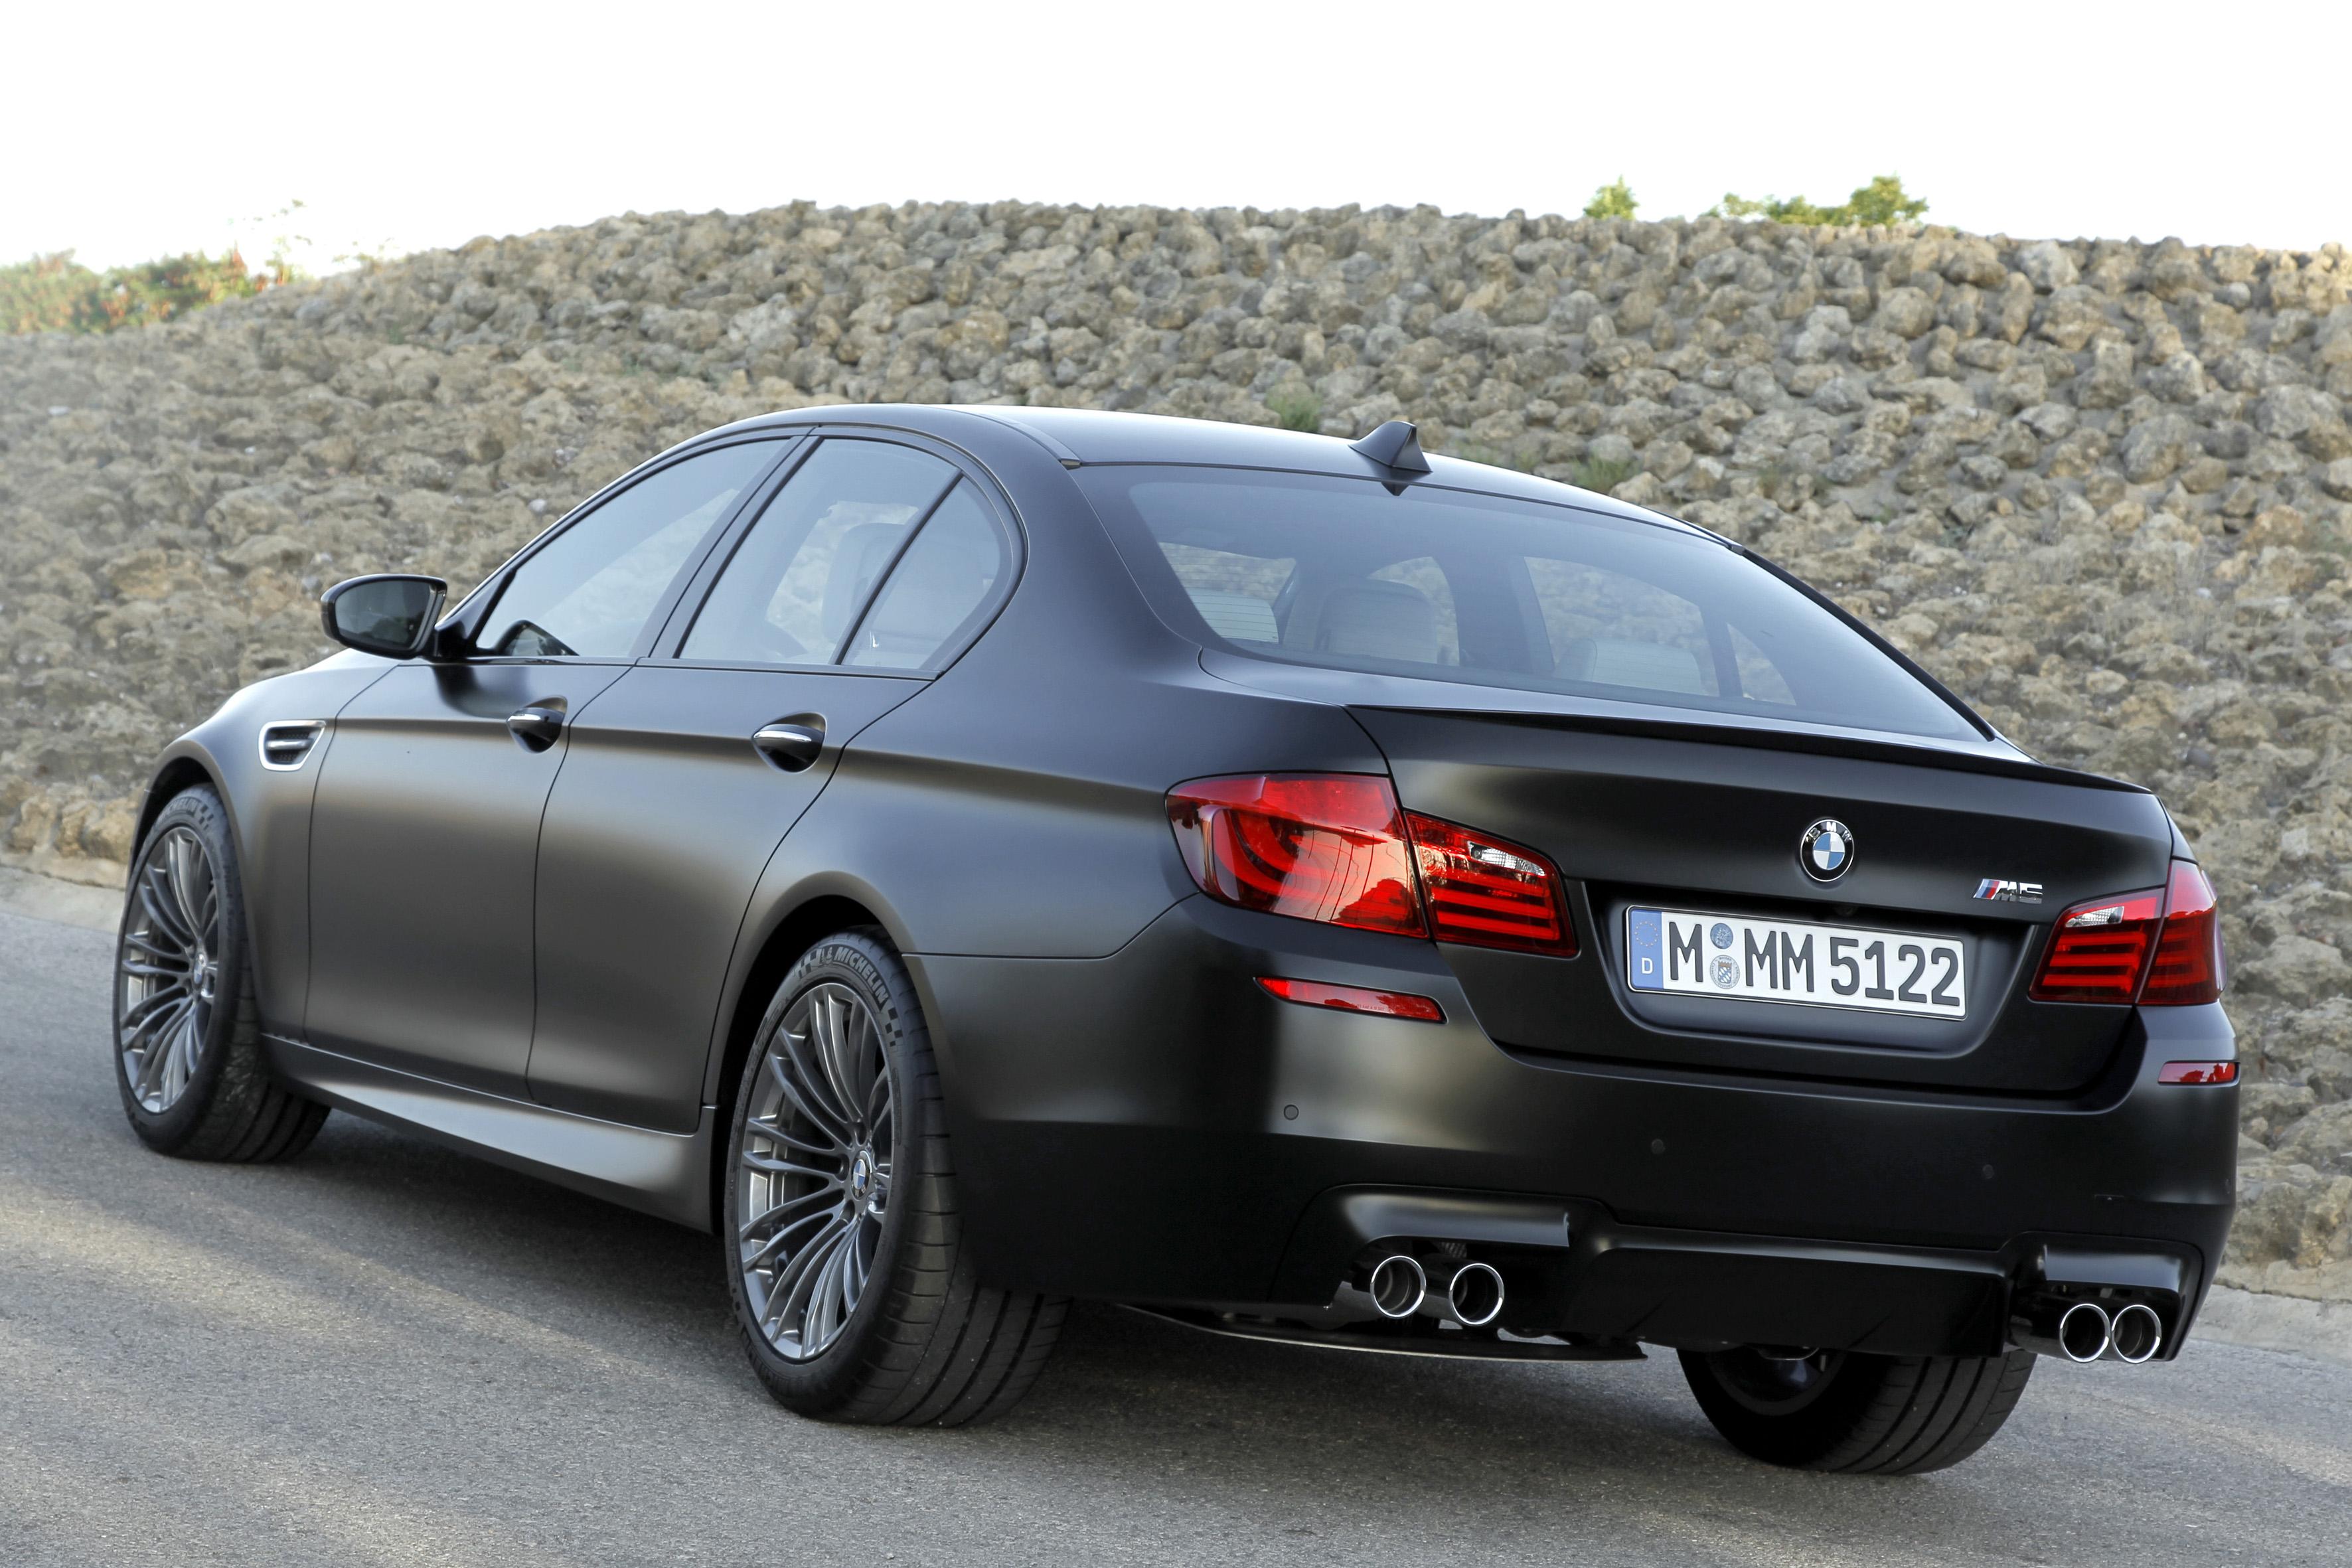 2018 Bmw M5 >> F10 BMW M5 showcased in Frozen Black matte paintjob Paul Tan - Image 72042